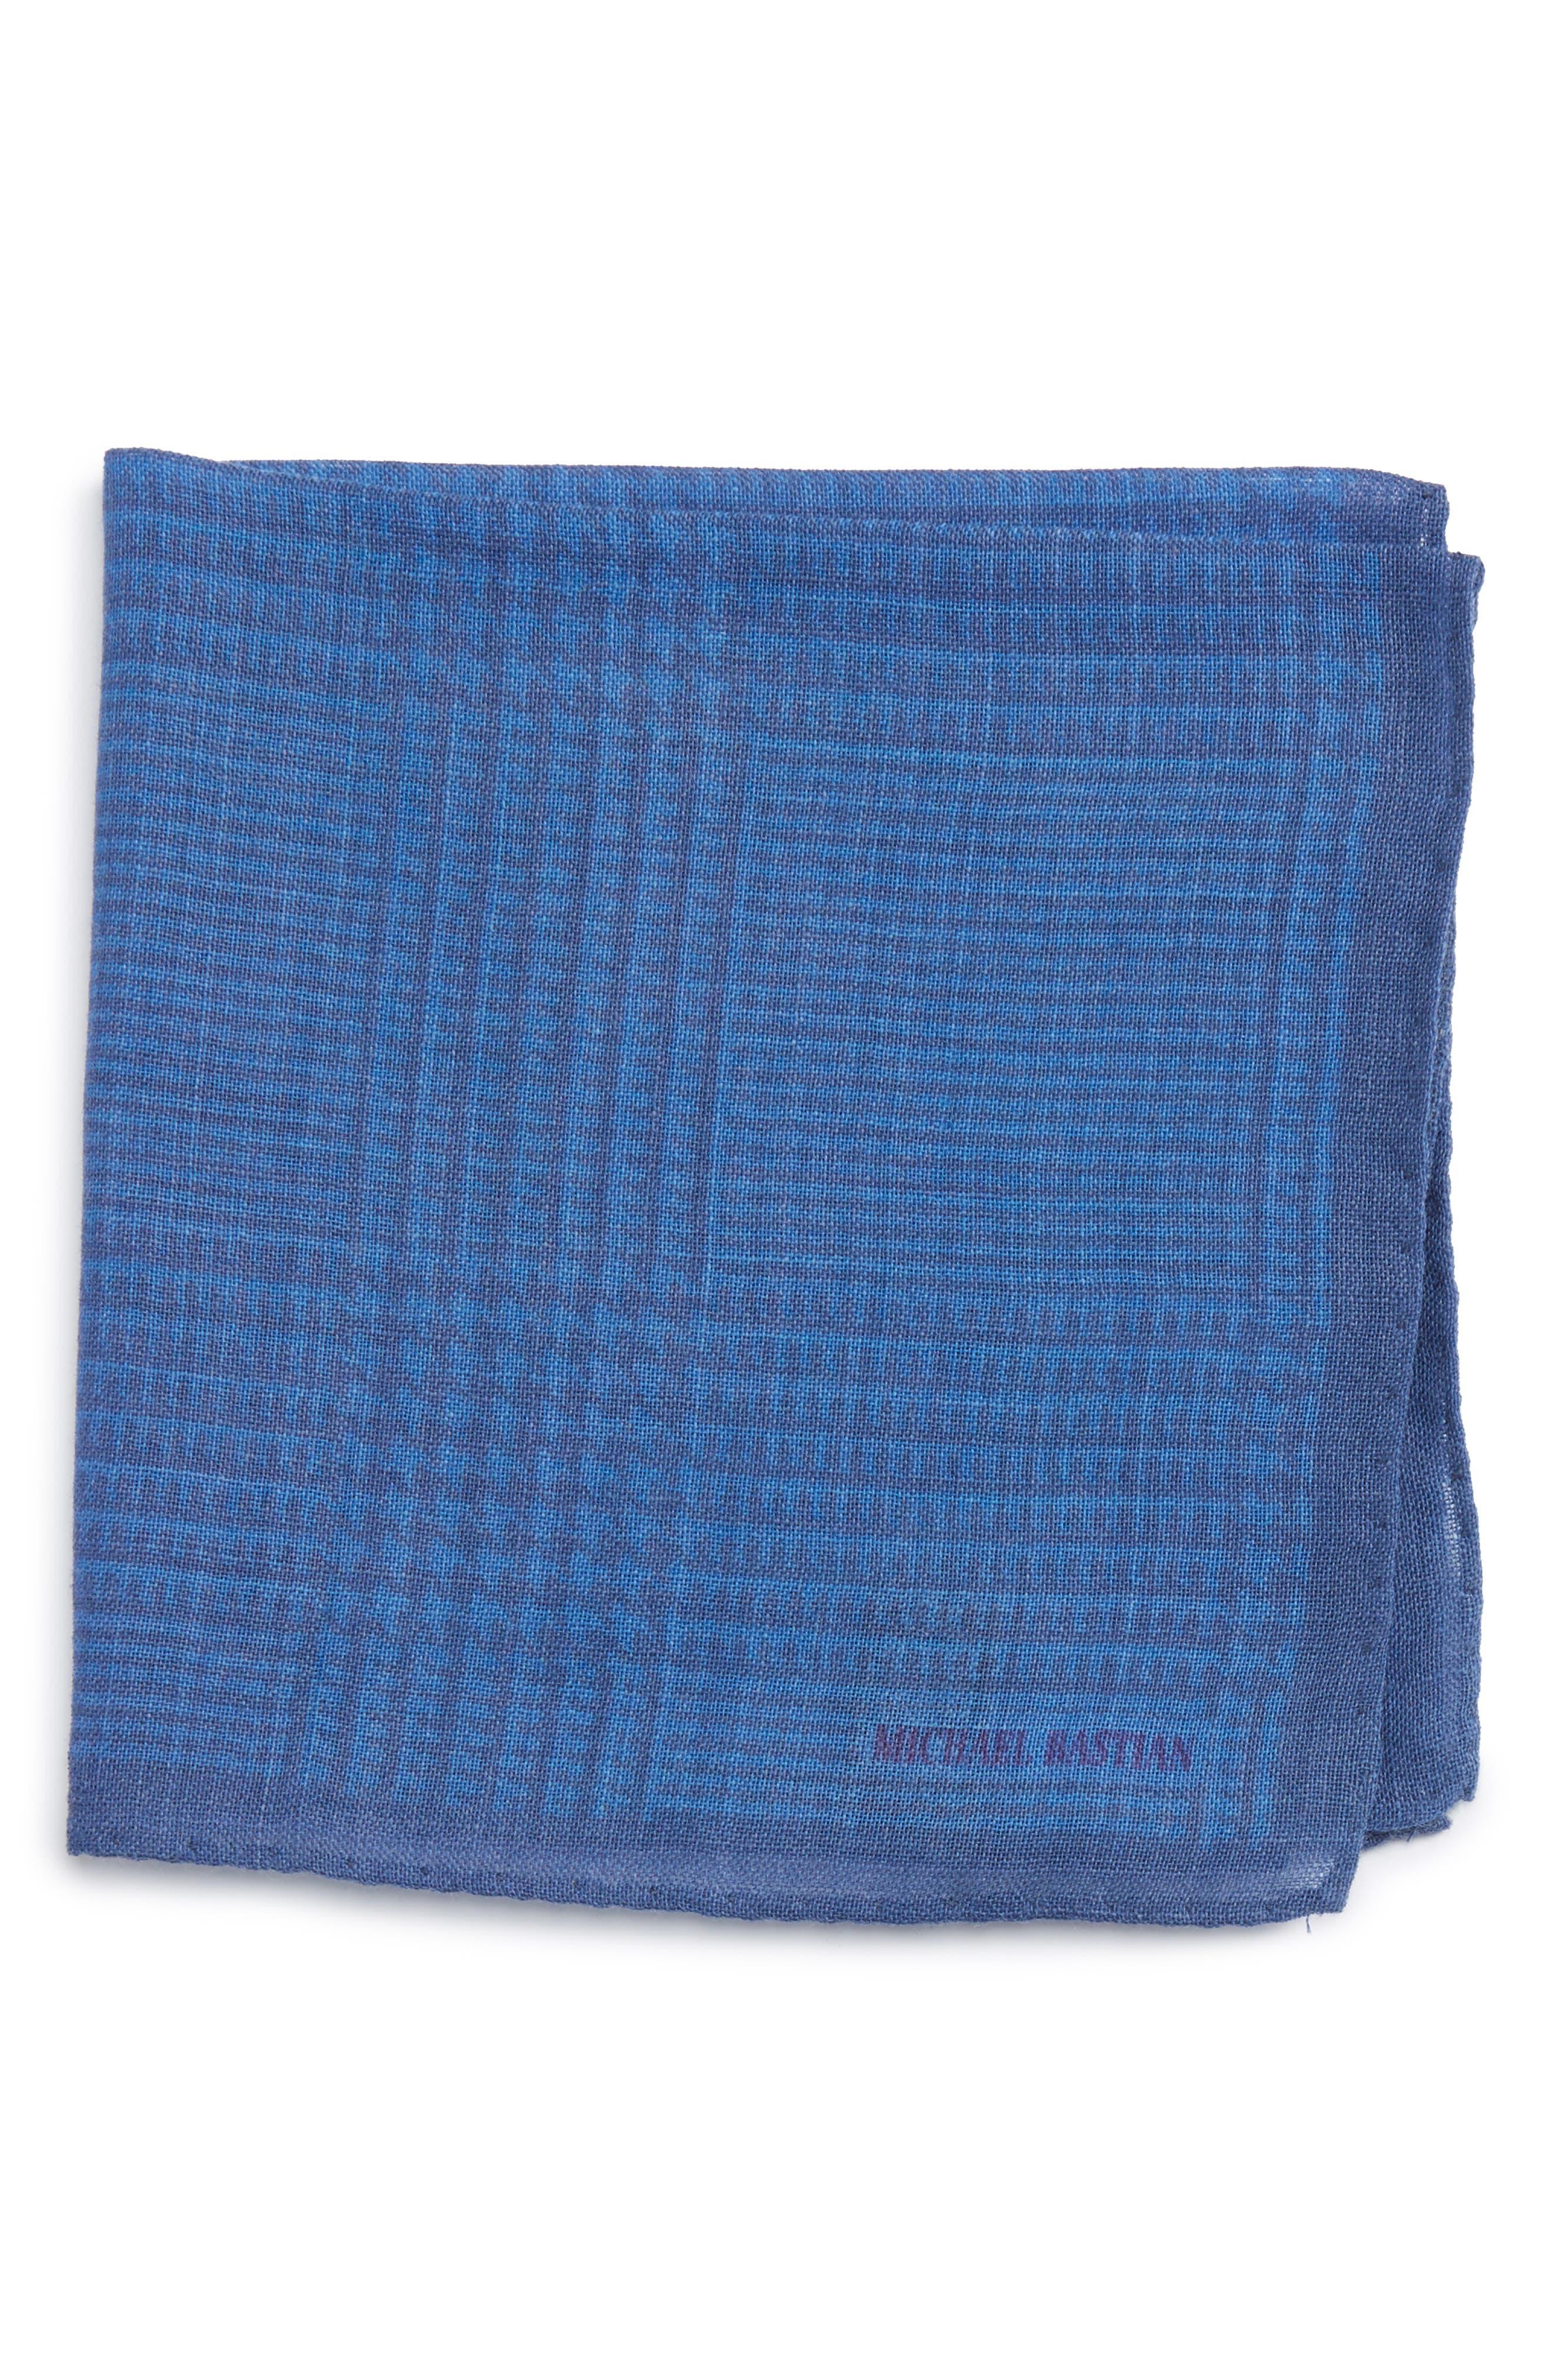 Grid Pocket Square,                         Main,                         color, Blue